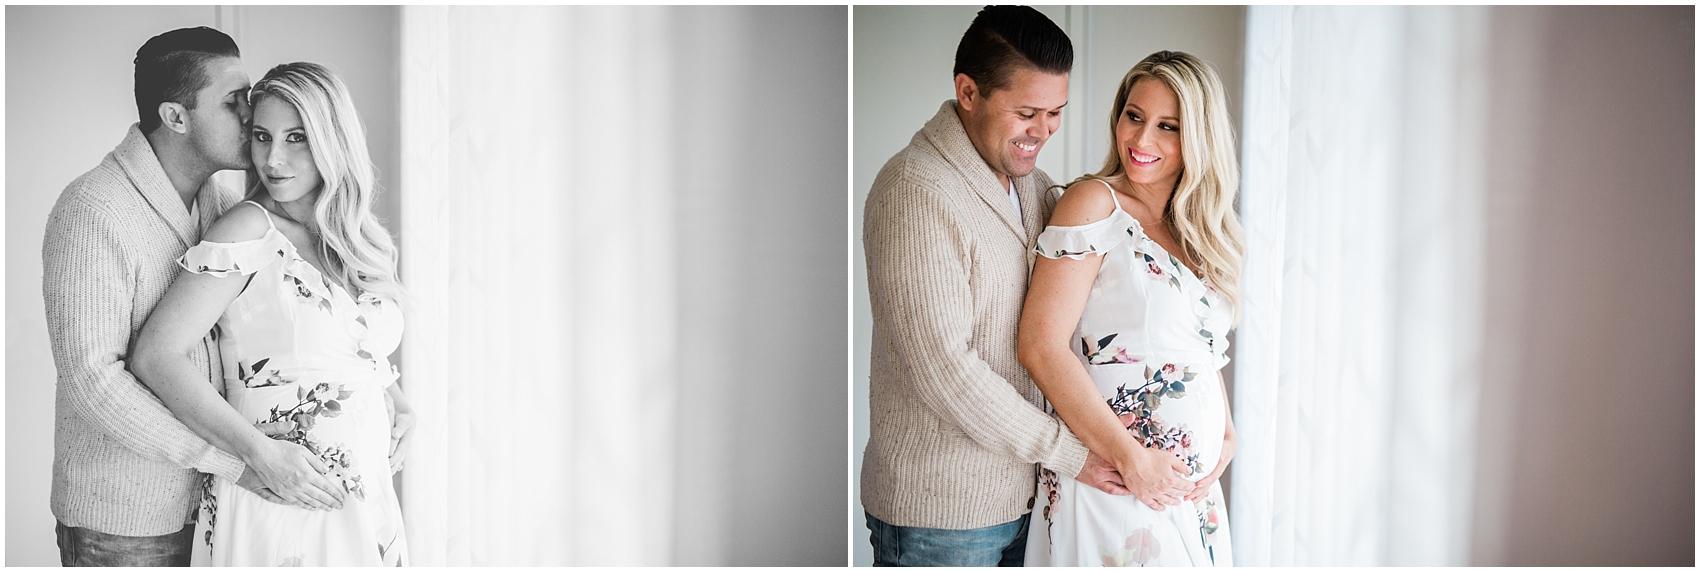 Shawntel and Aaron Maternity-0017.jpg